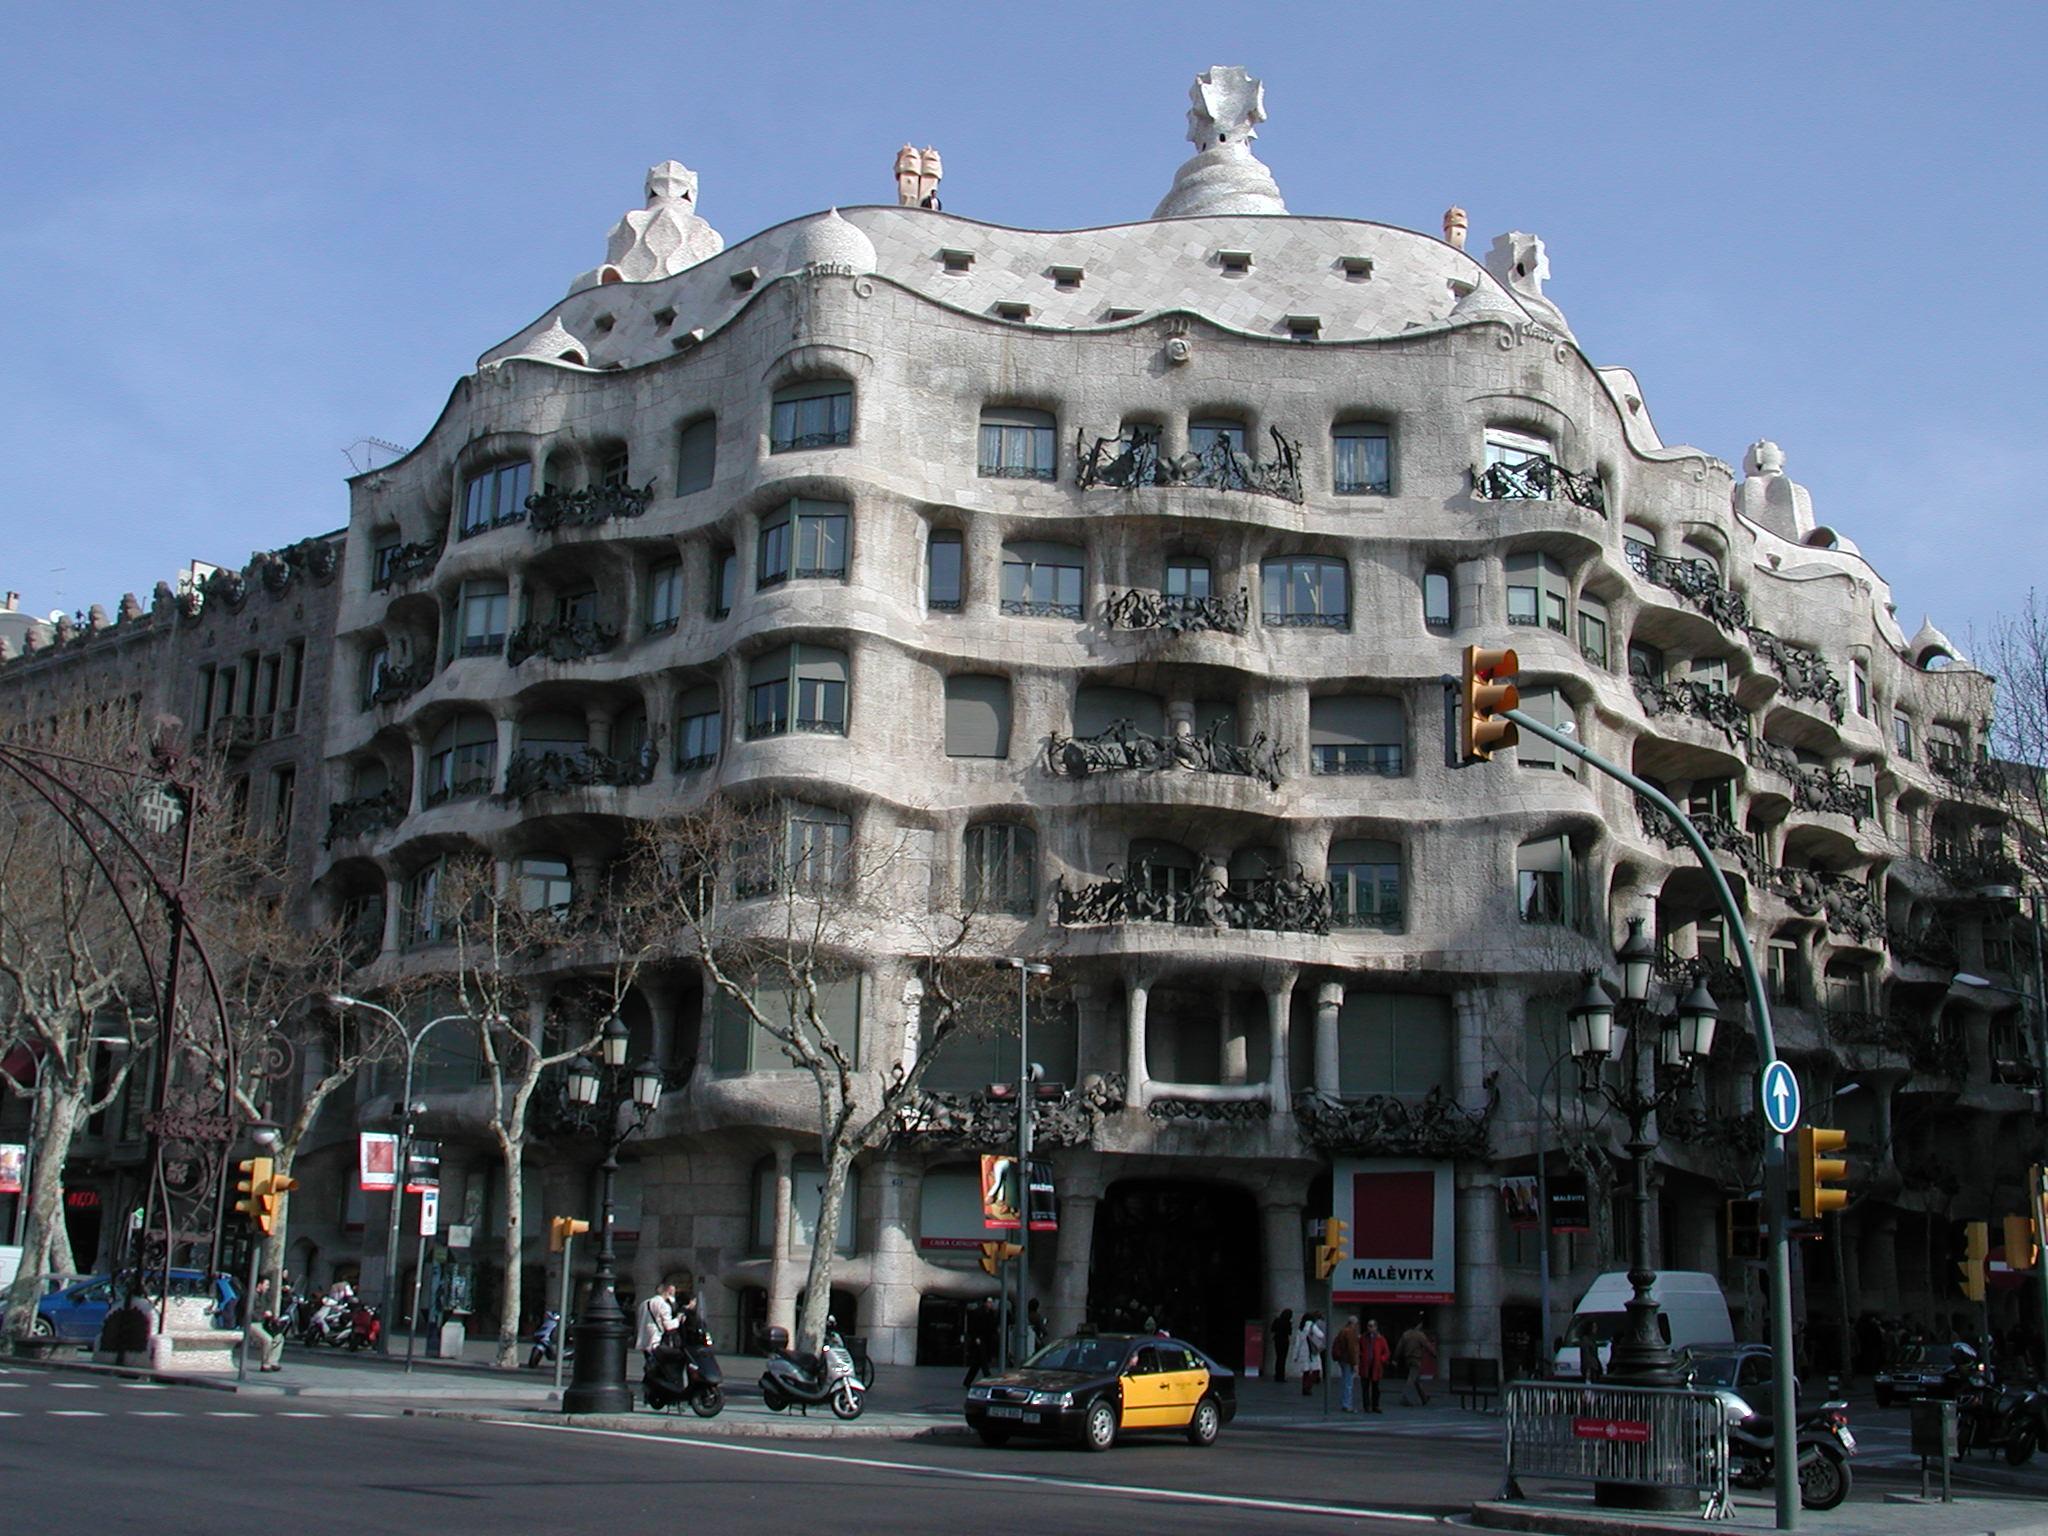 Barcelona casa mila gaudì.jpg